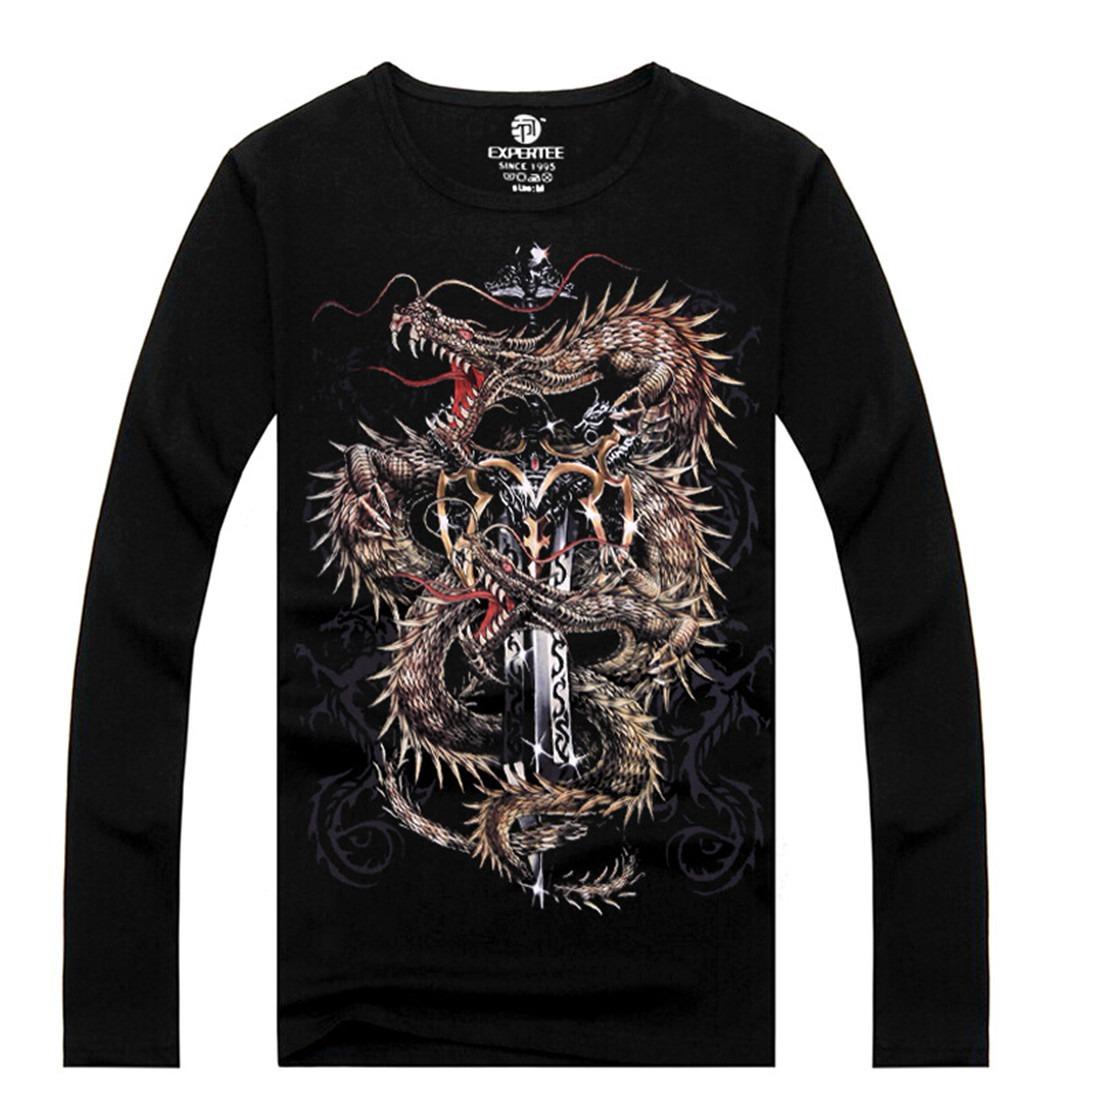 Autumn Winter Basic Black 3D Printing Long Sleeve Fleece Body Warm Shirt Sweater